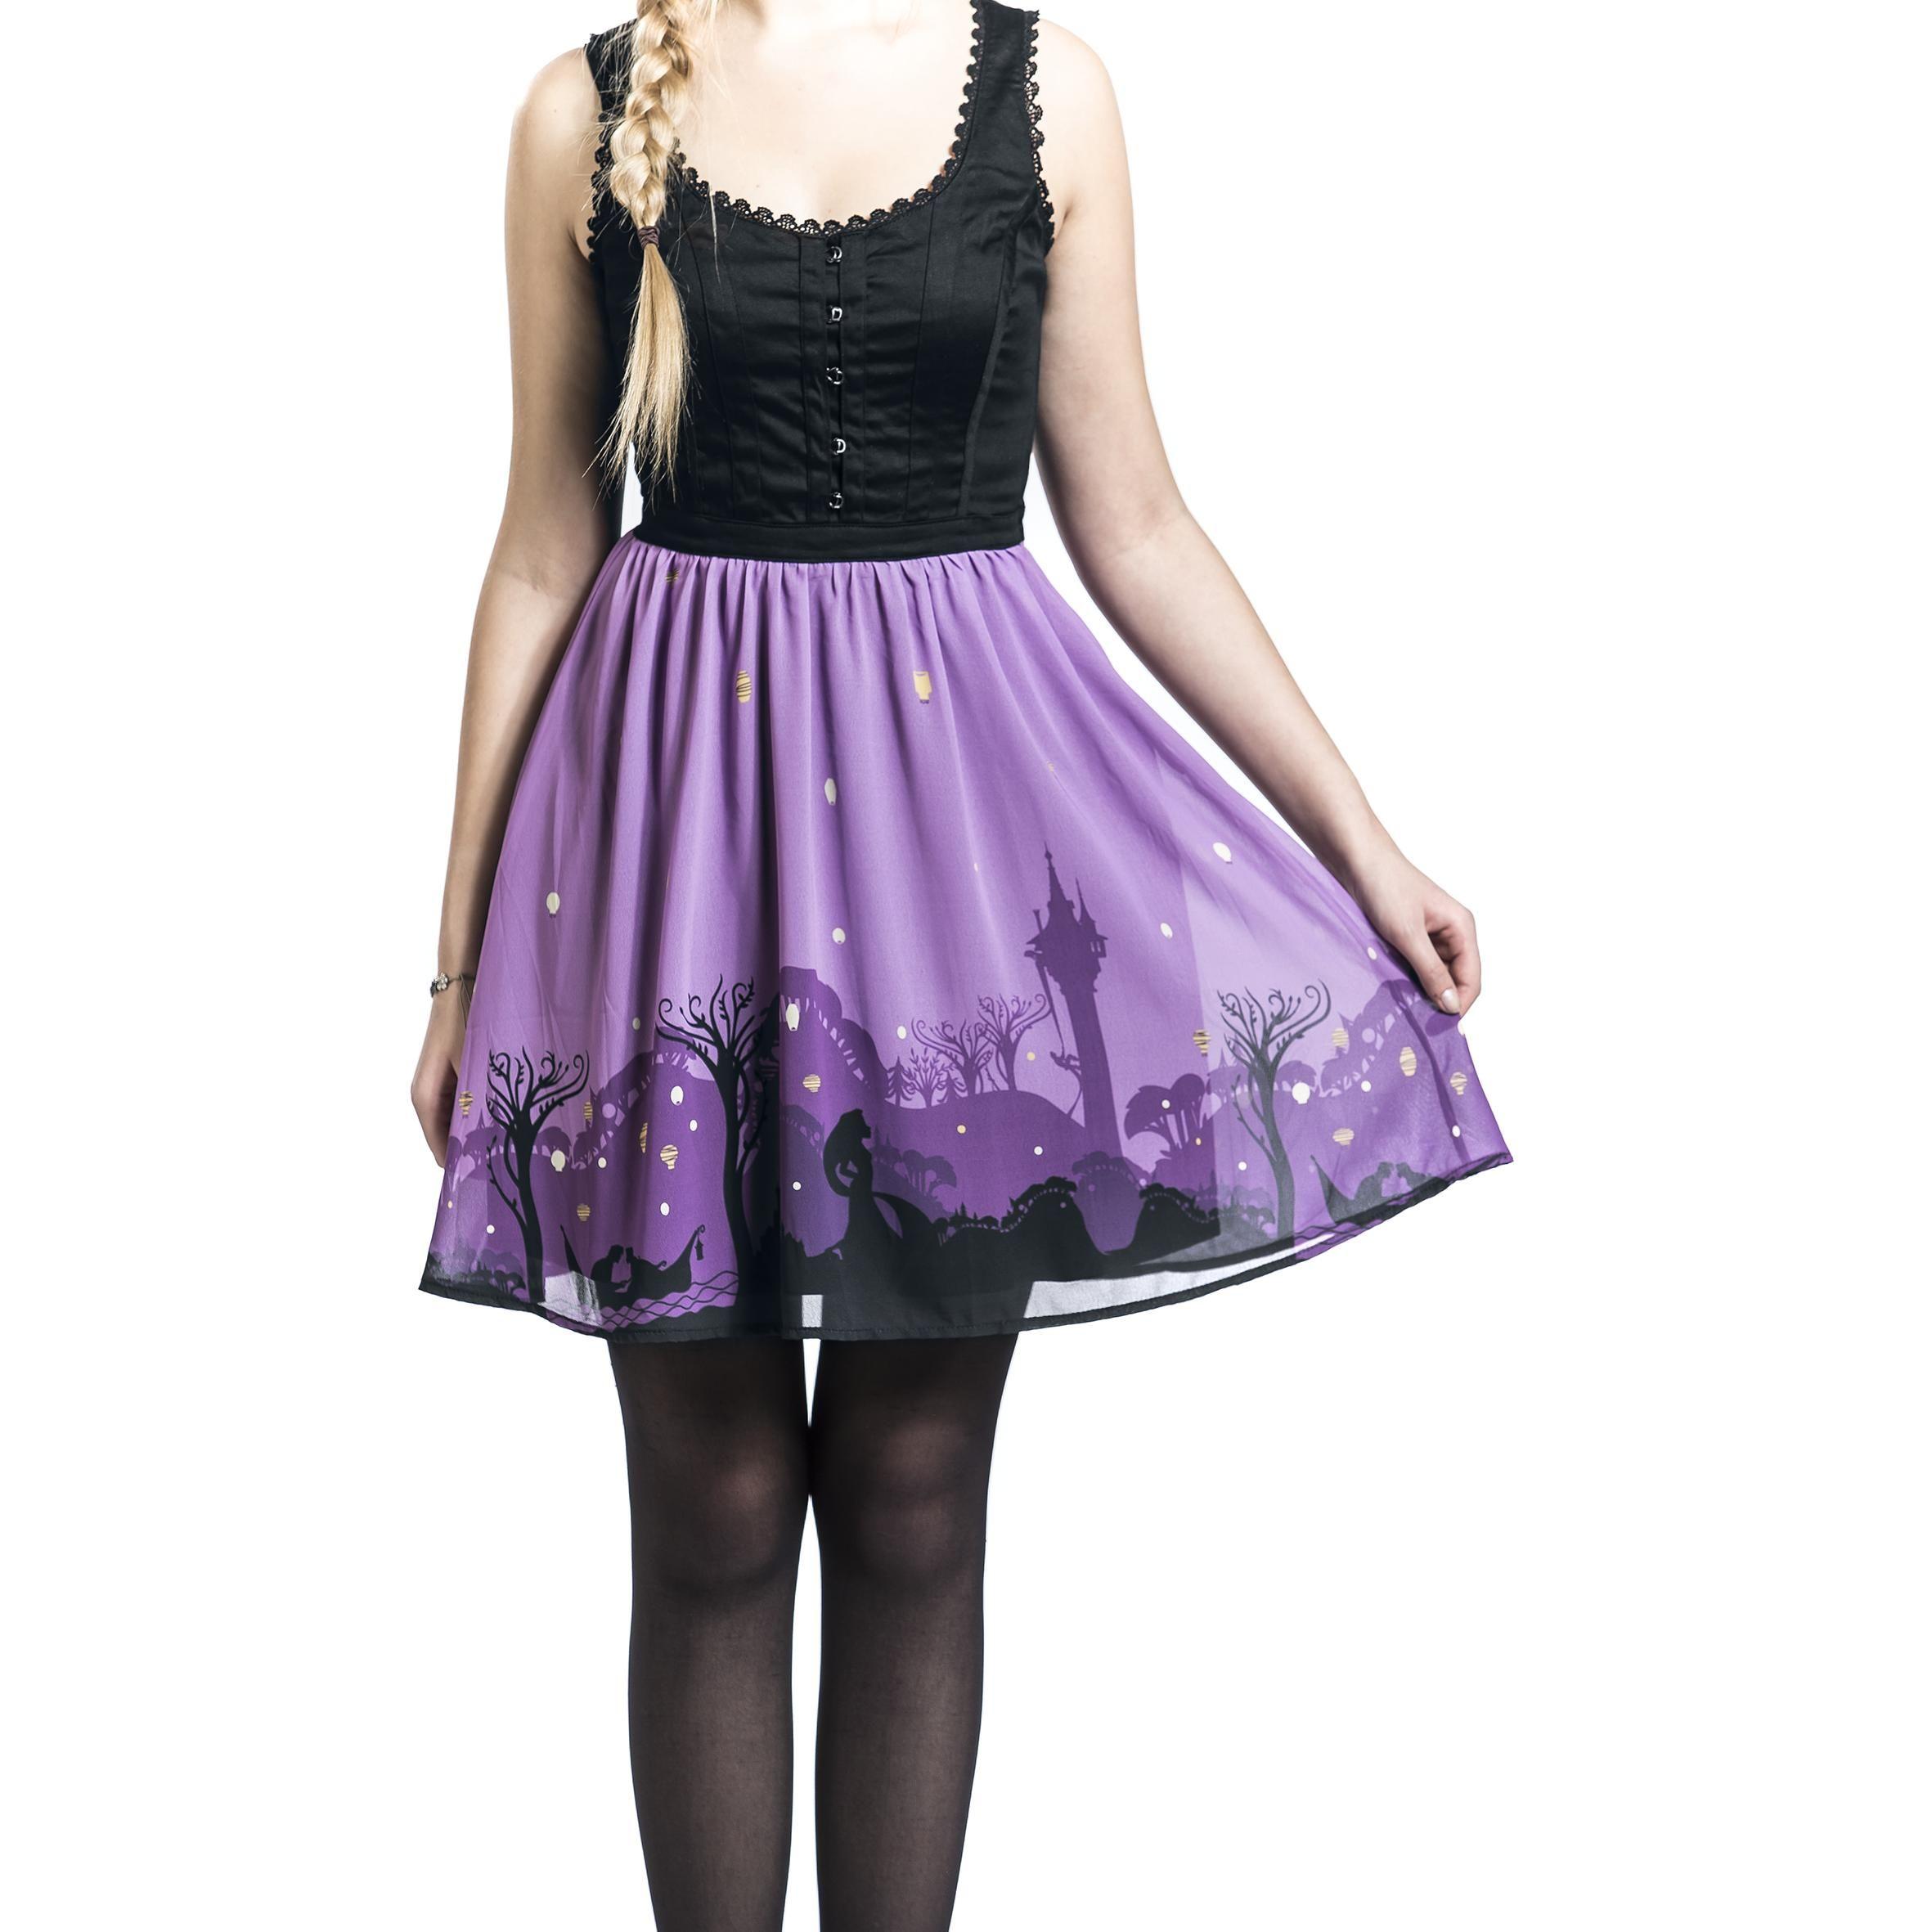 Tangled Corset-style Dress | Fun Clothing | Pinterest